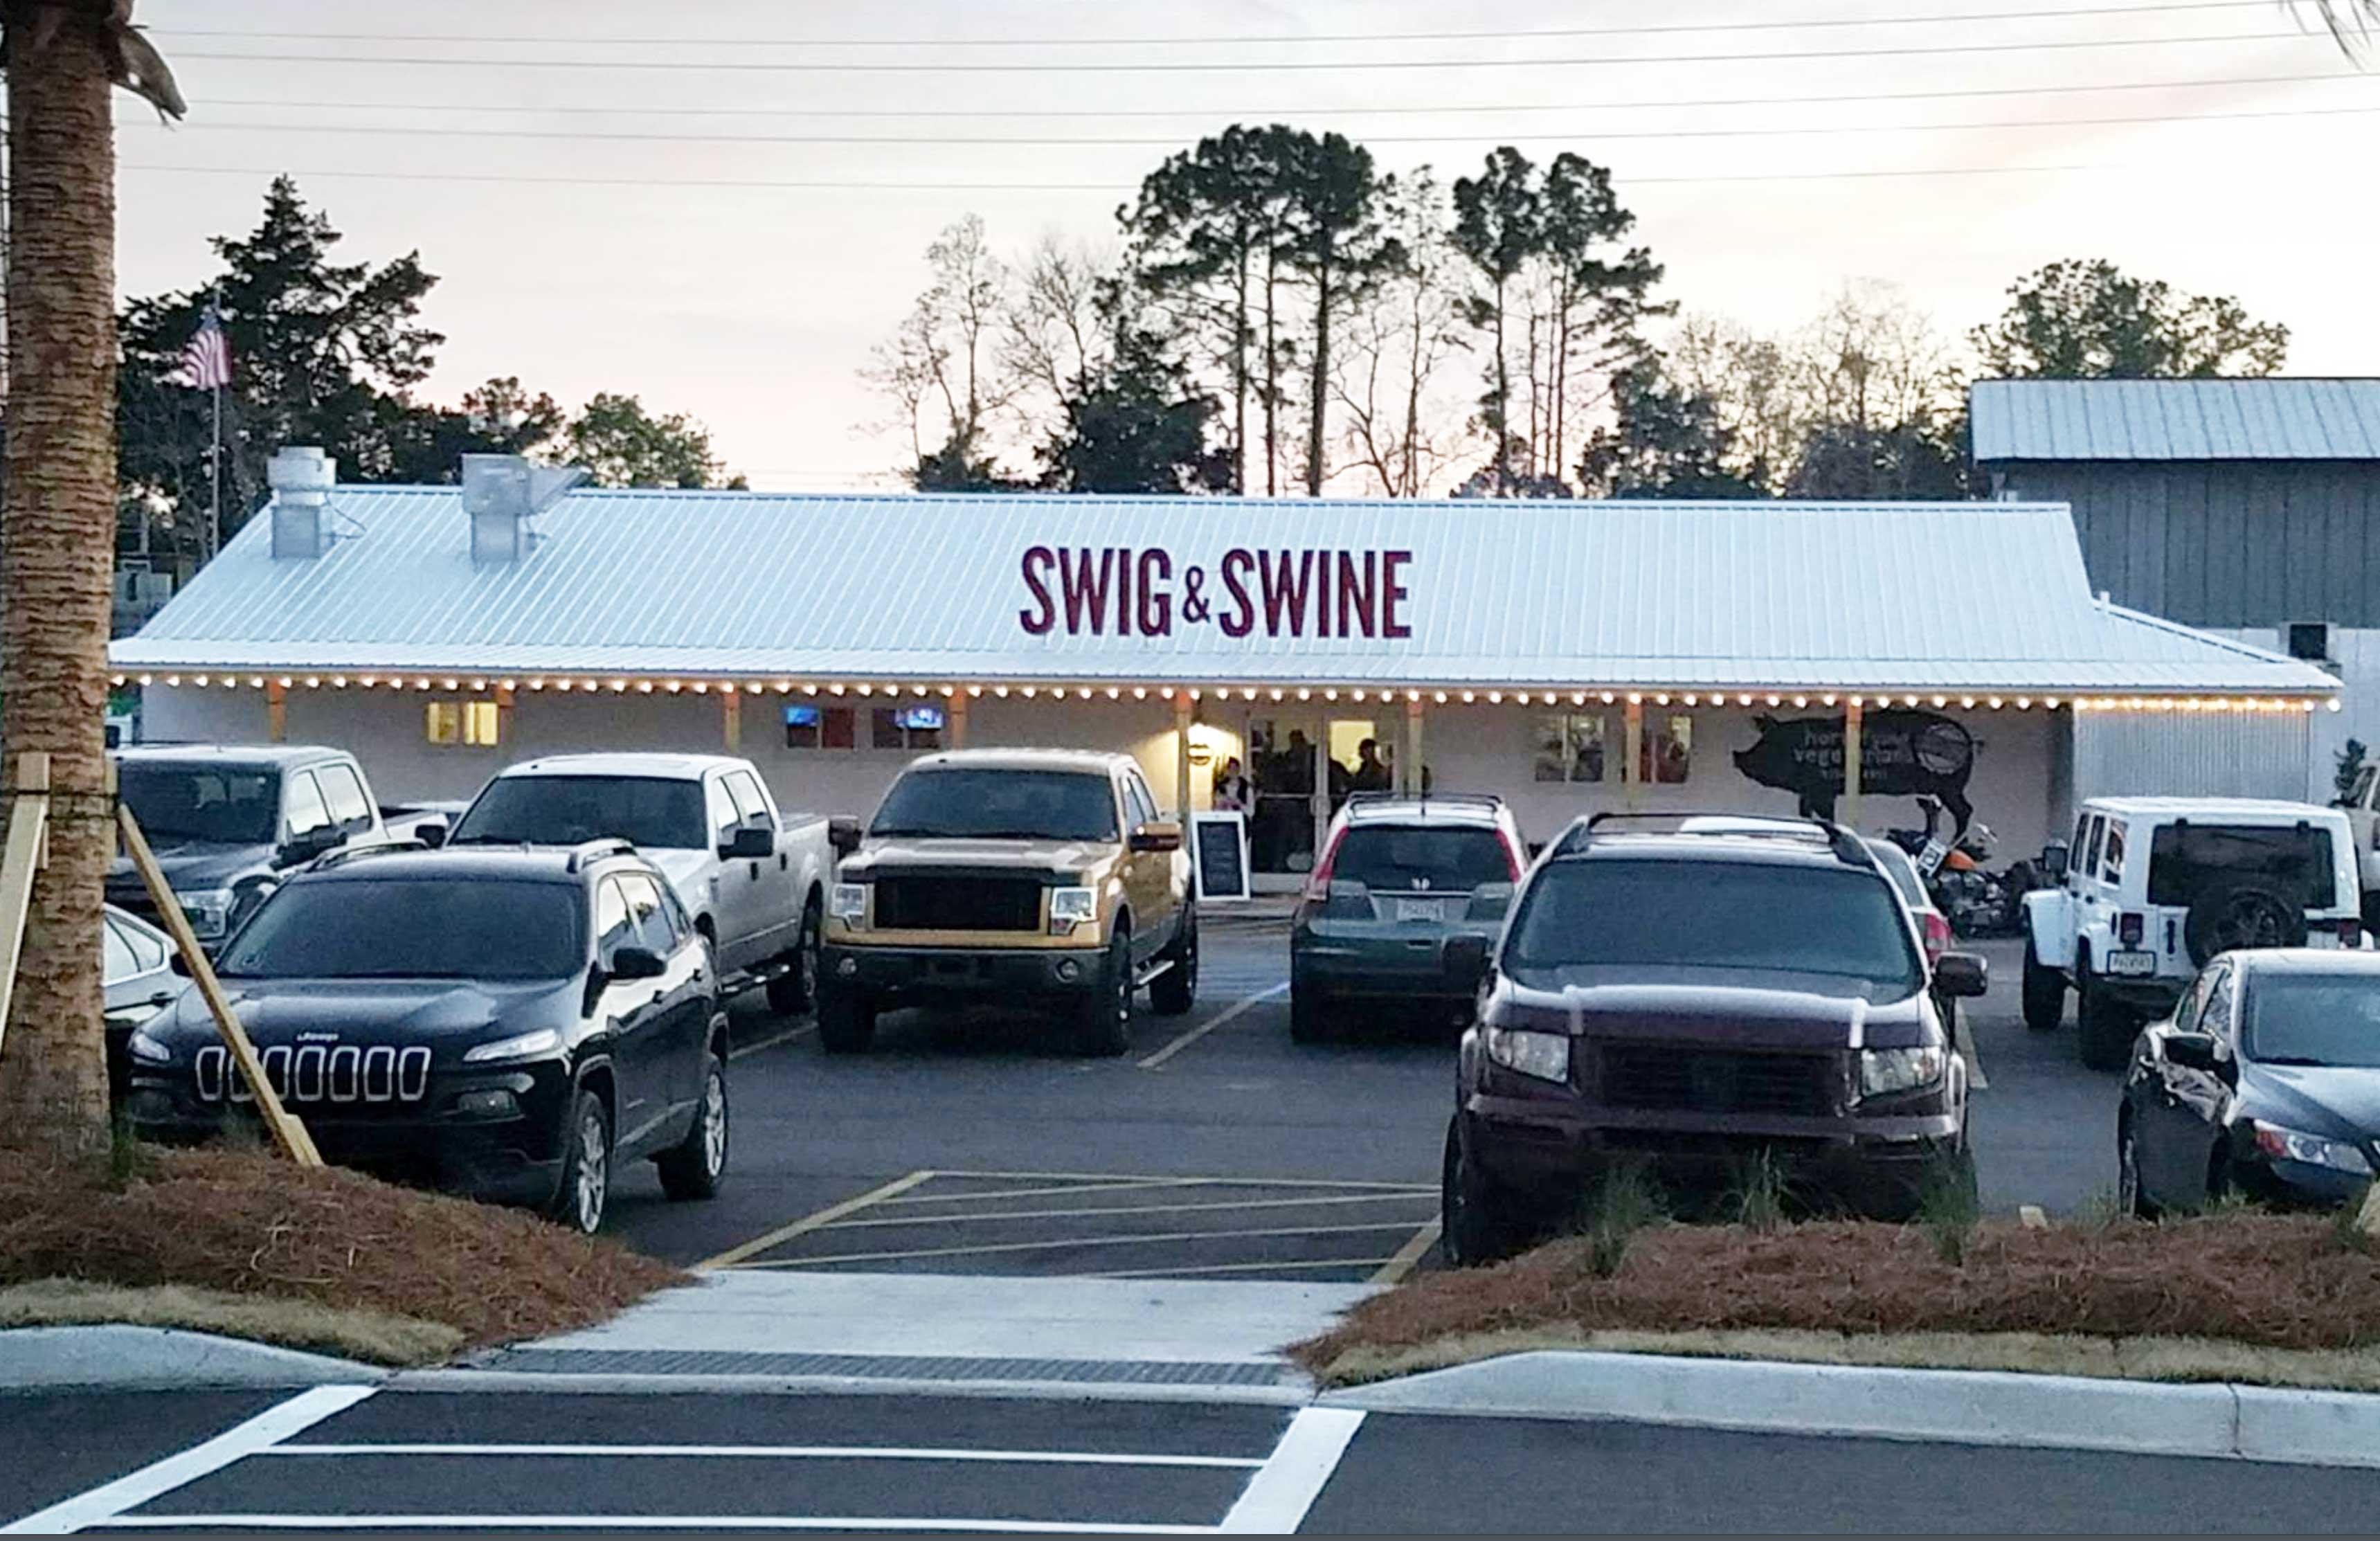 Swig and Swine in Mount Pleasant